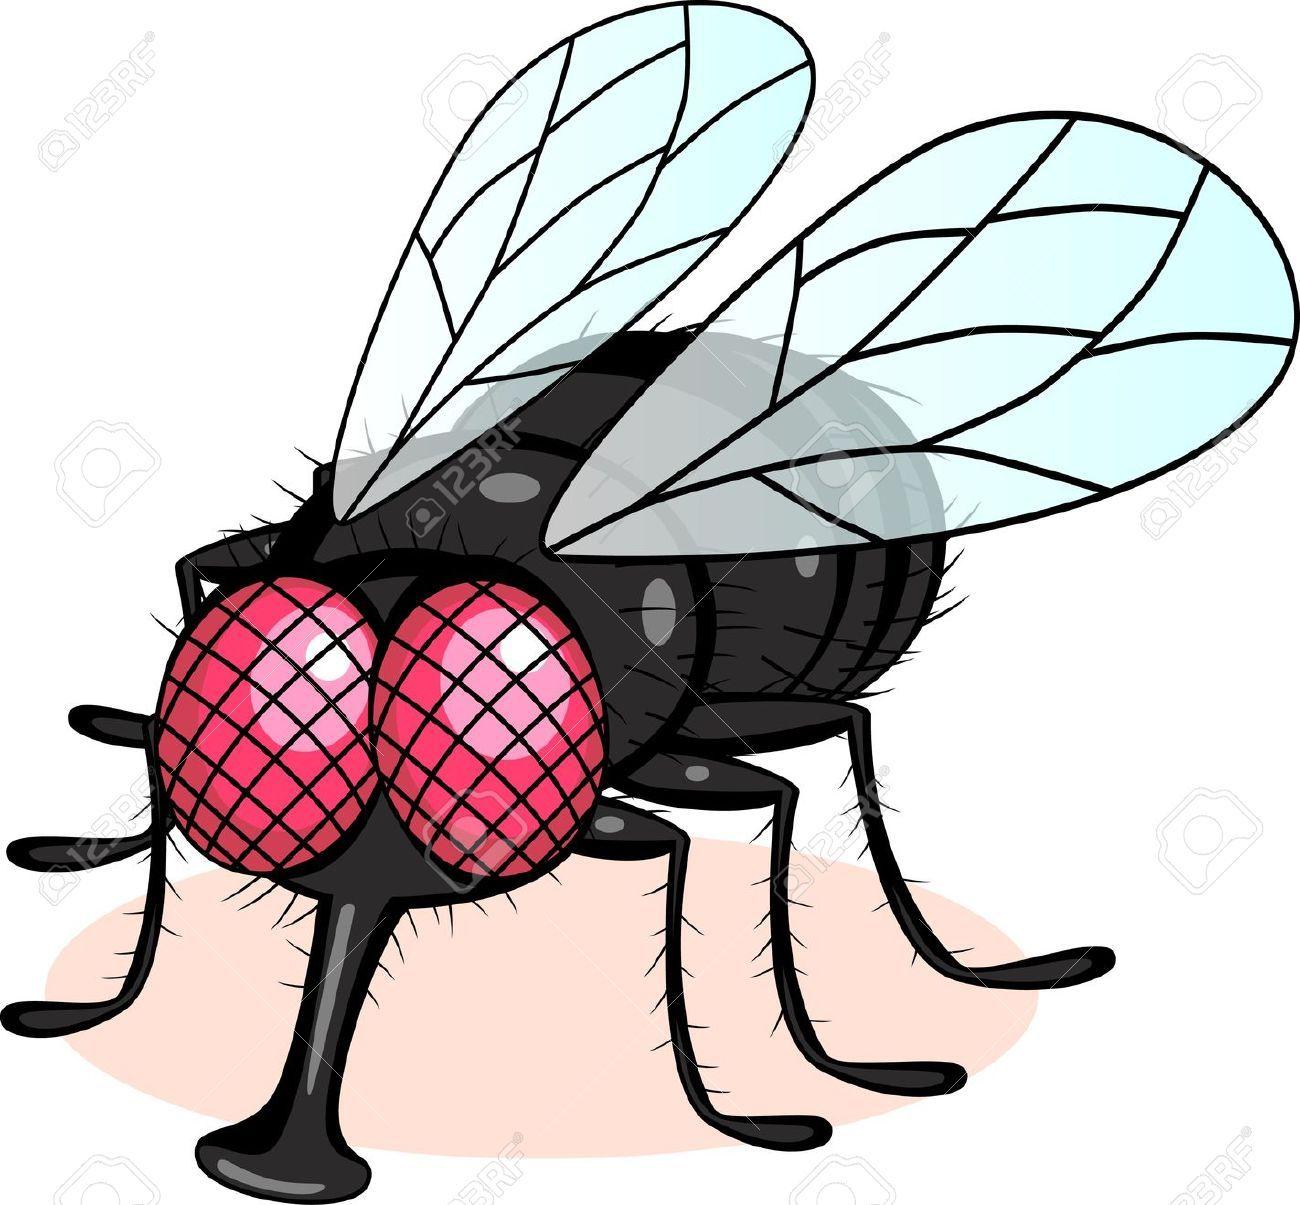 1300x1205 fly cartoon in thegioidongvat fly drawing, cartoon